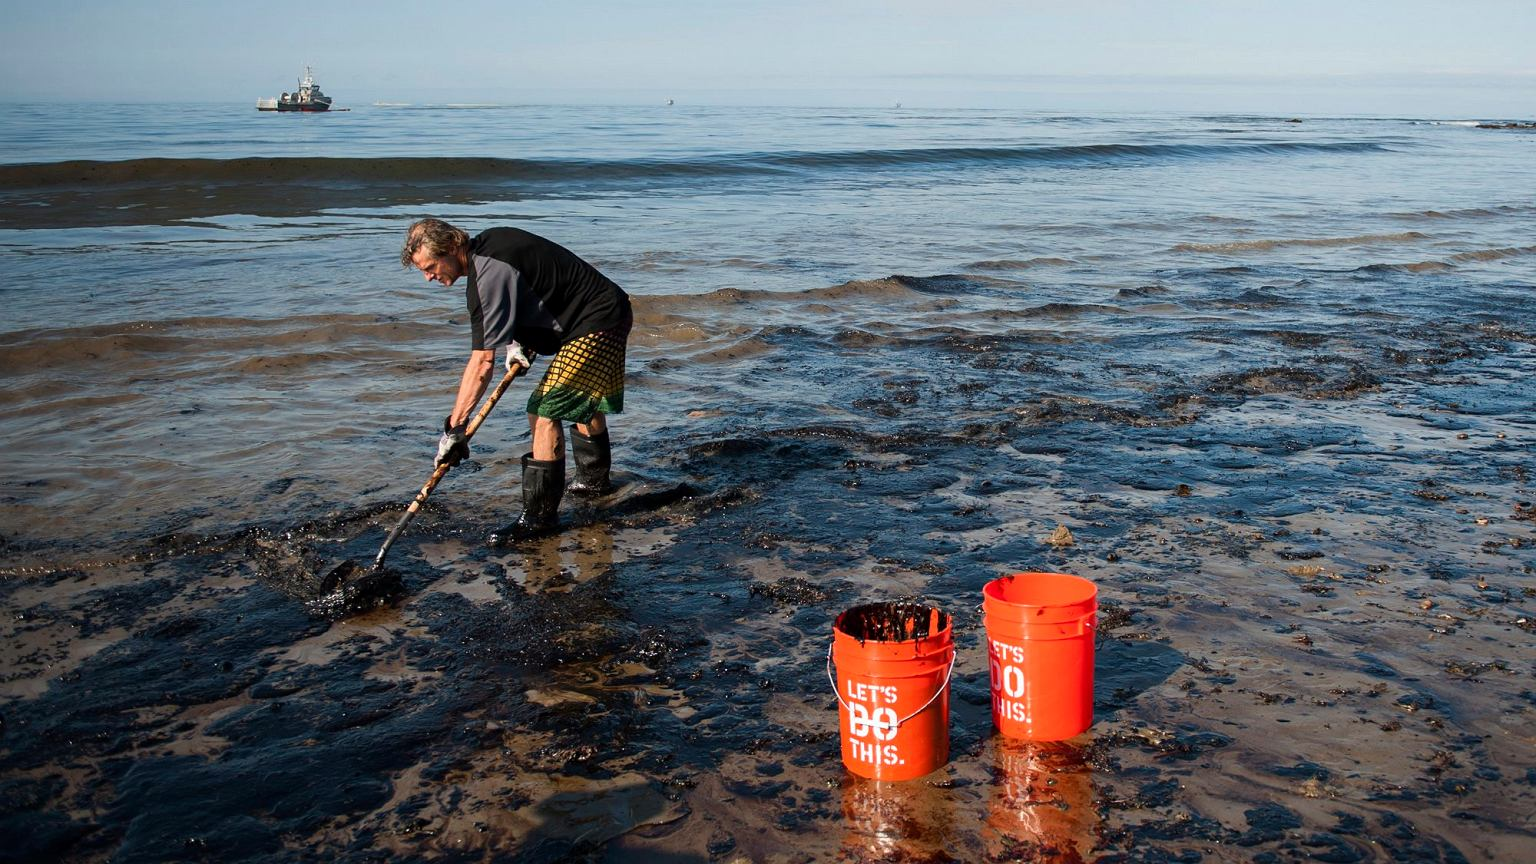 загрязнение океана пестицидами